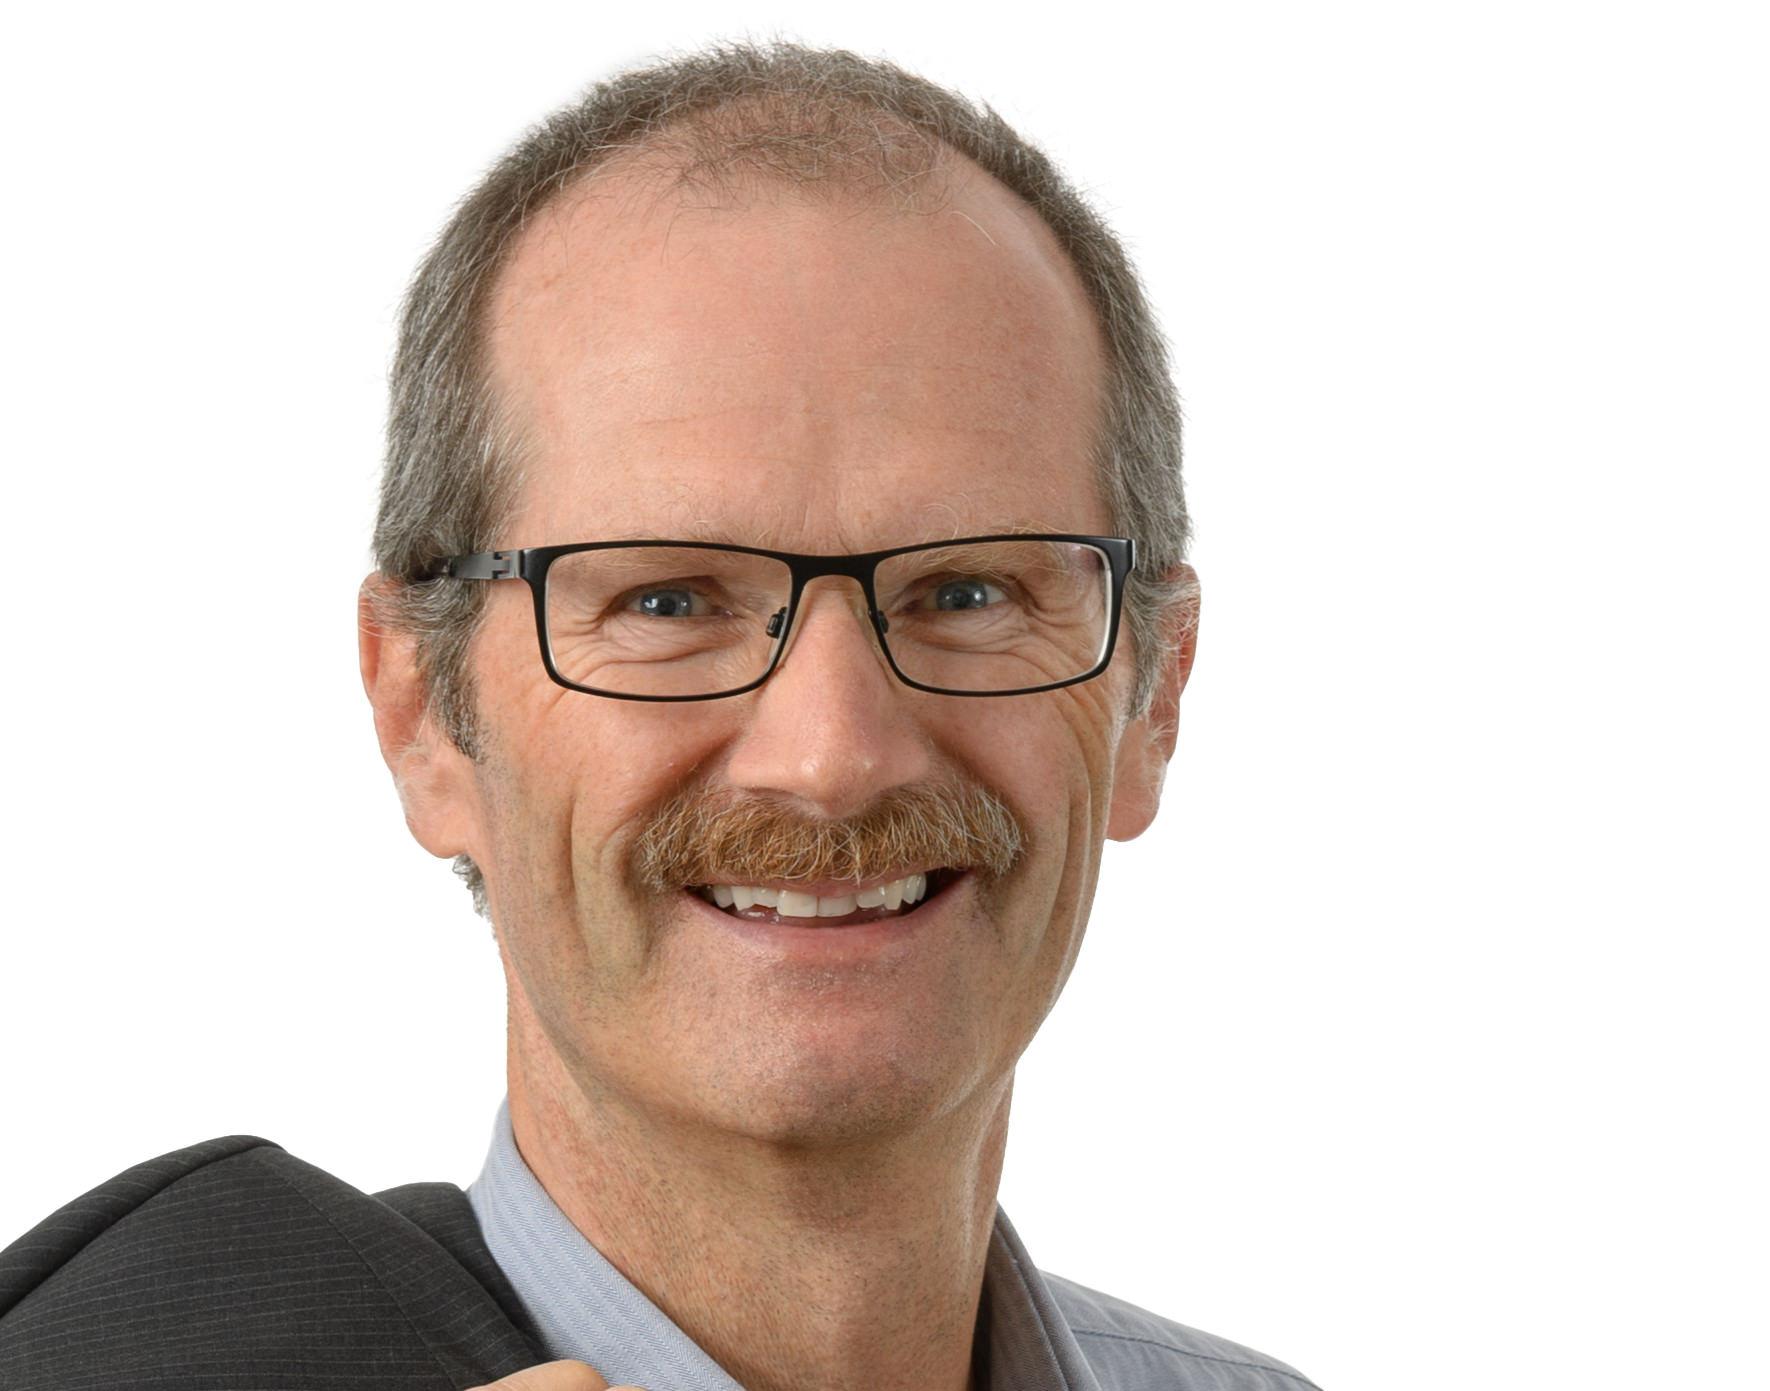 André Ott